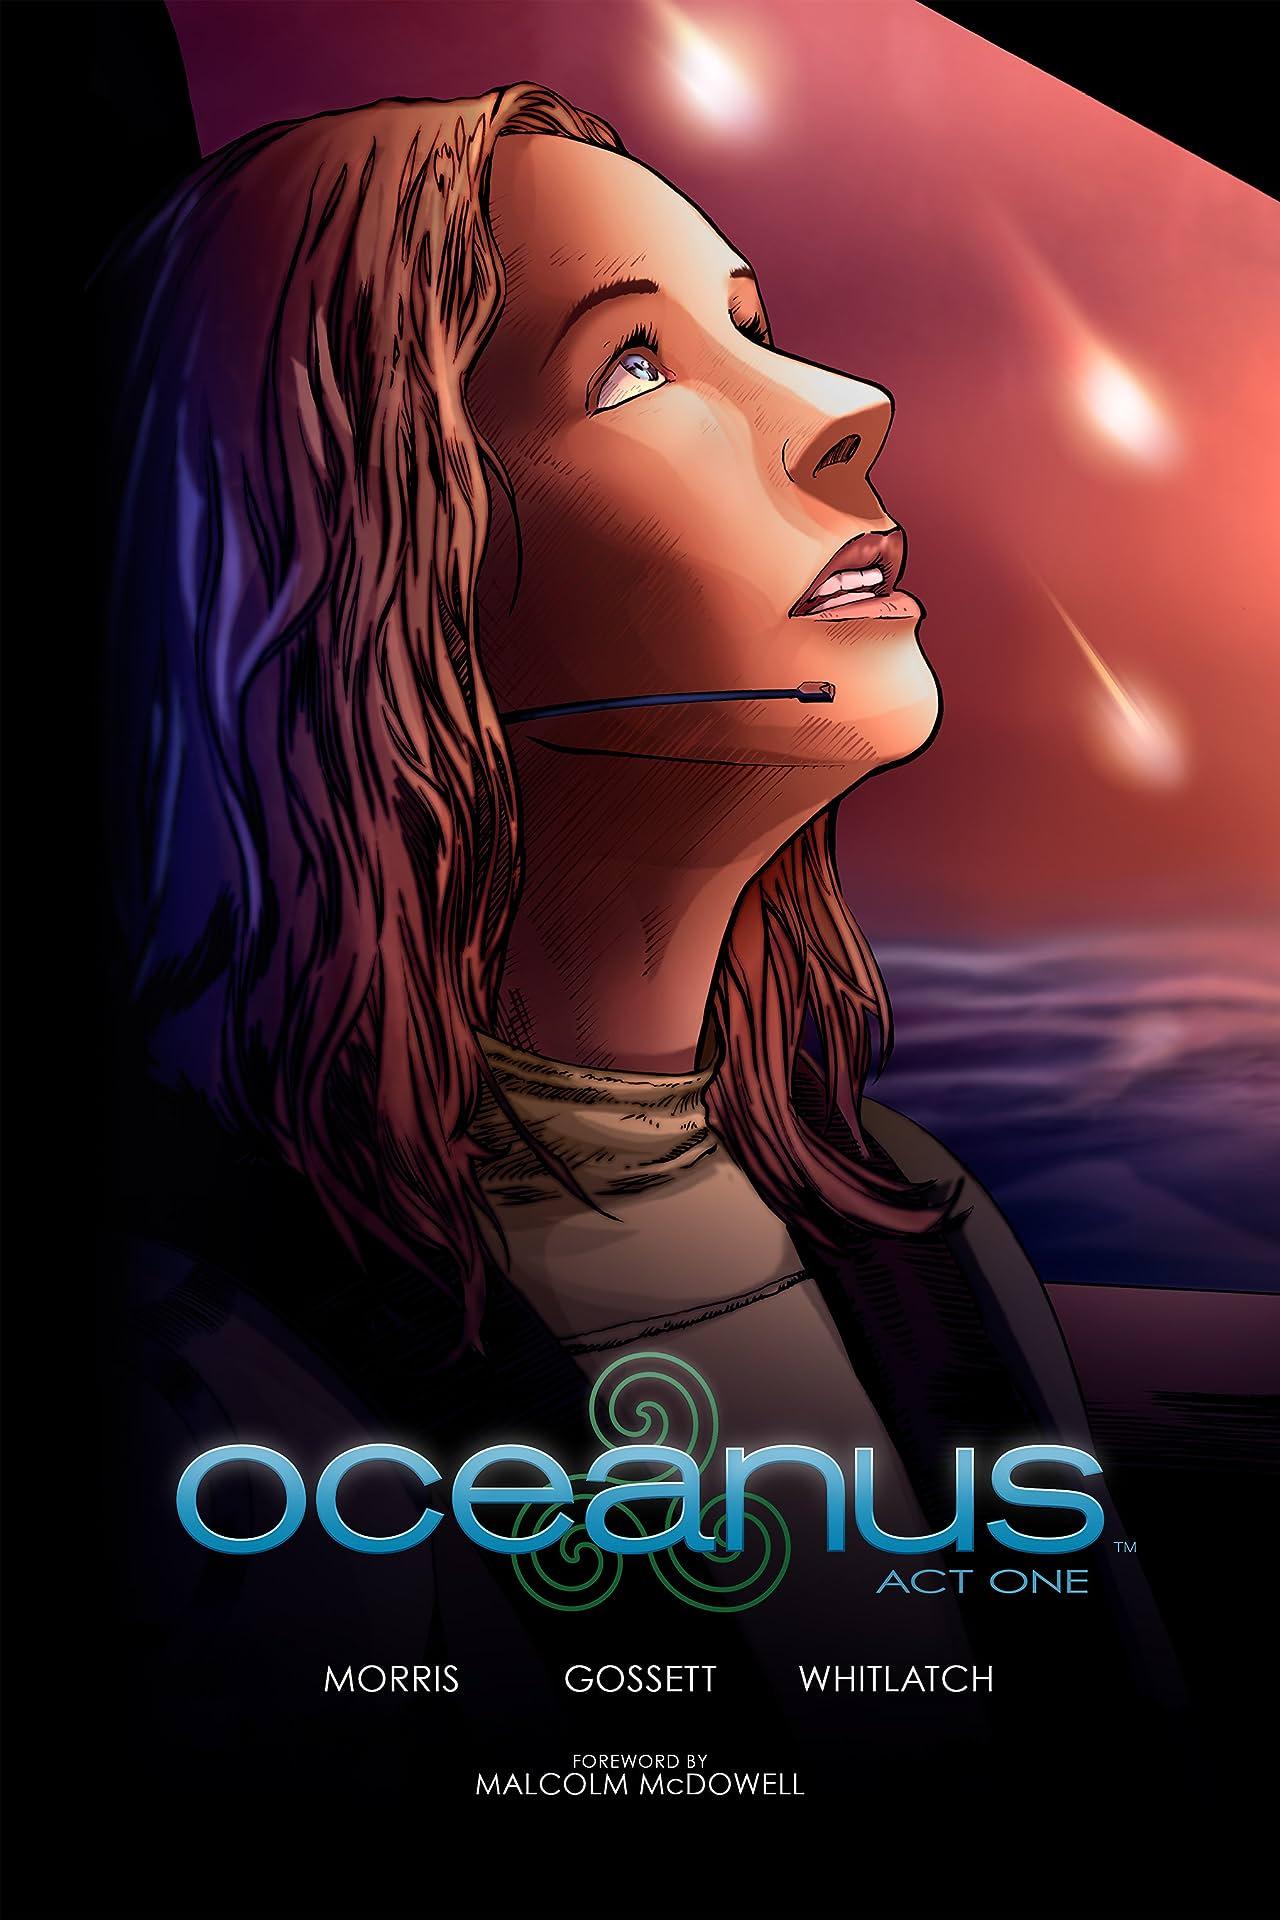 Oceanus: Act One